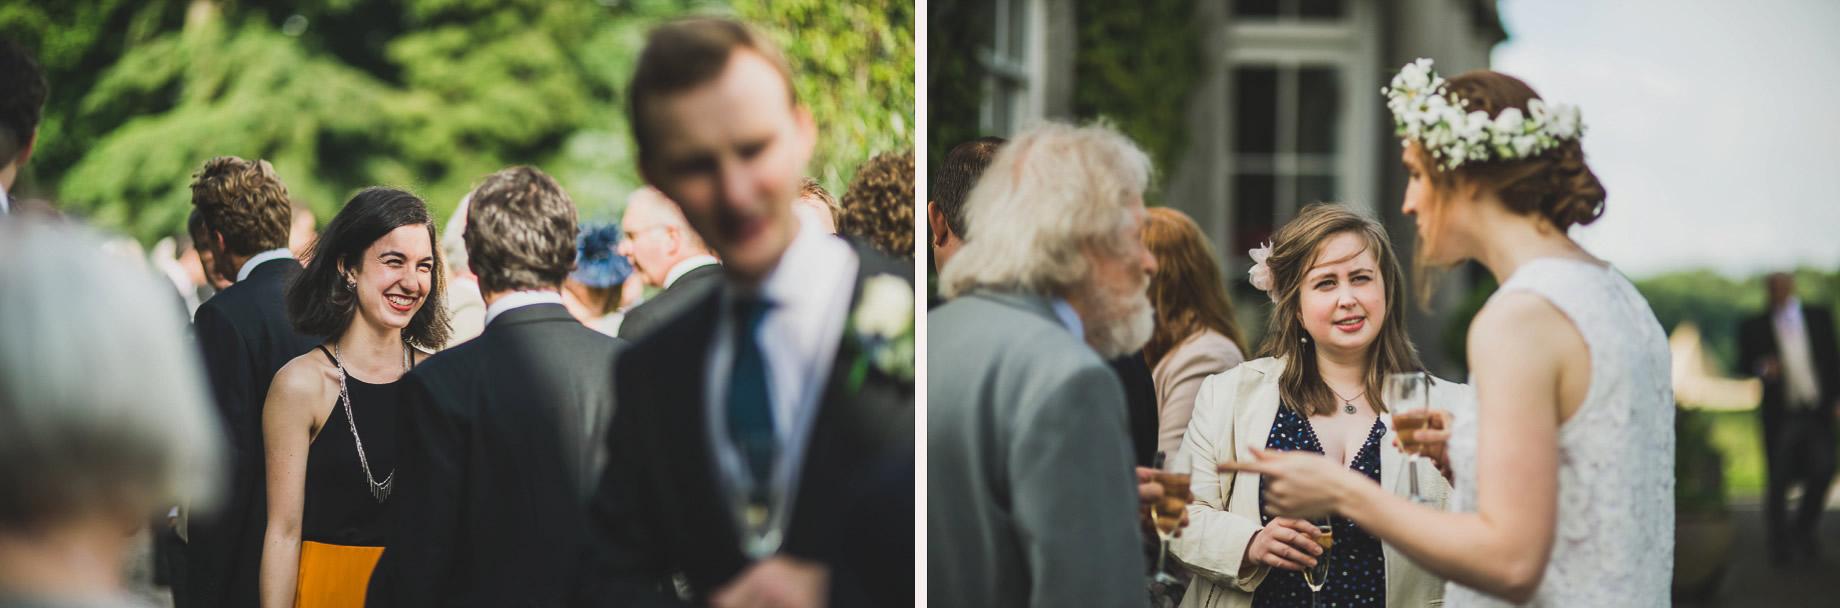 Julia and Simon's Wedding at Yealand Manor 090